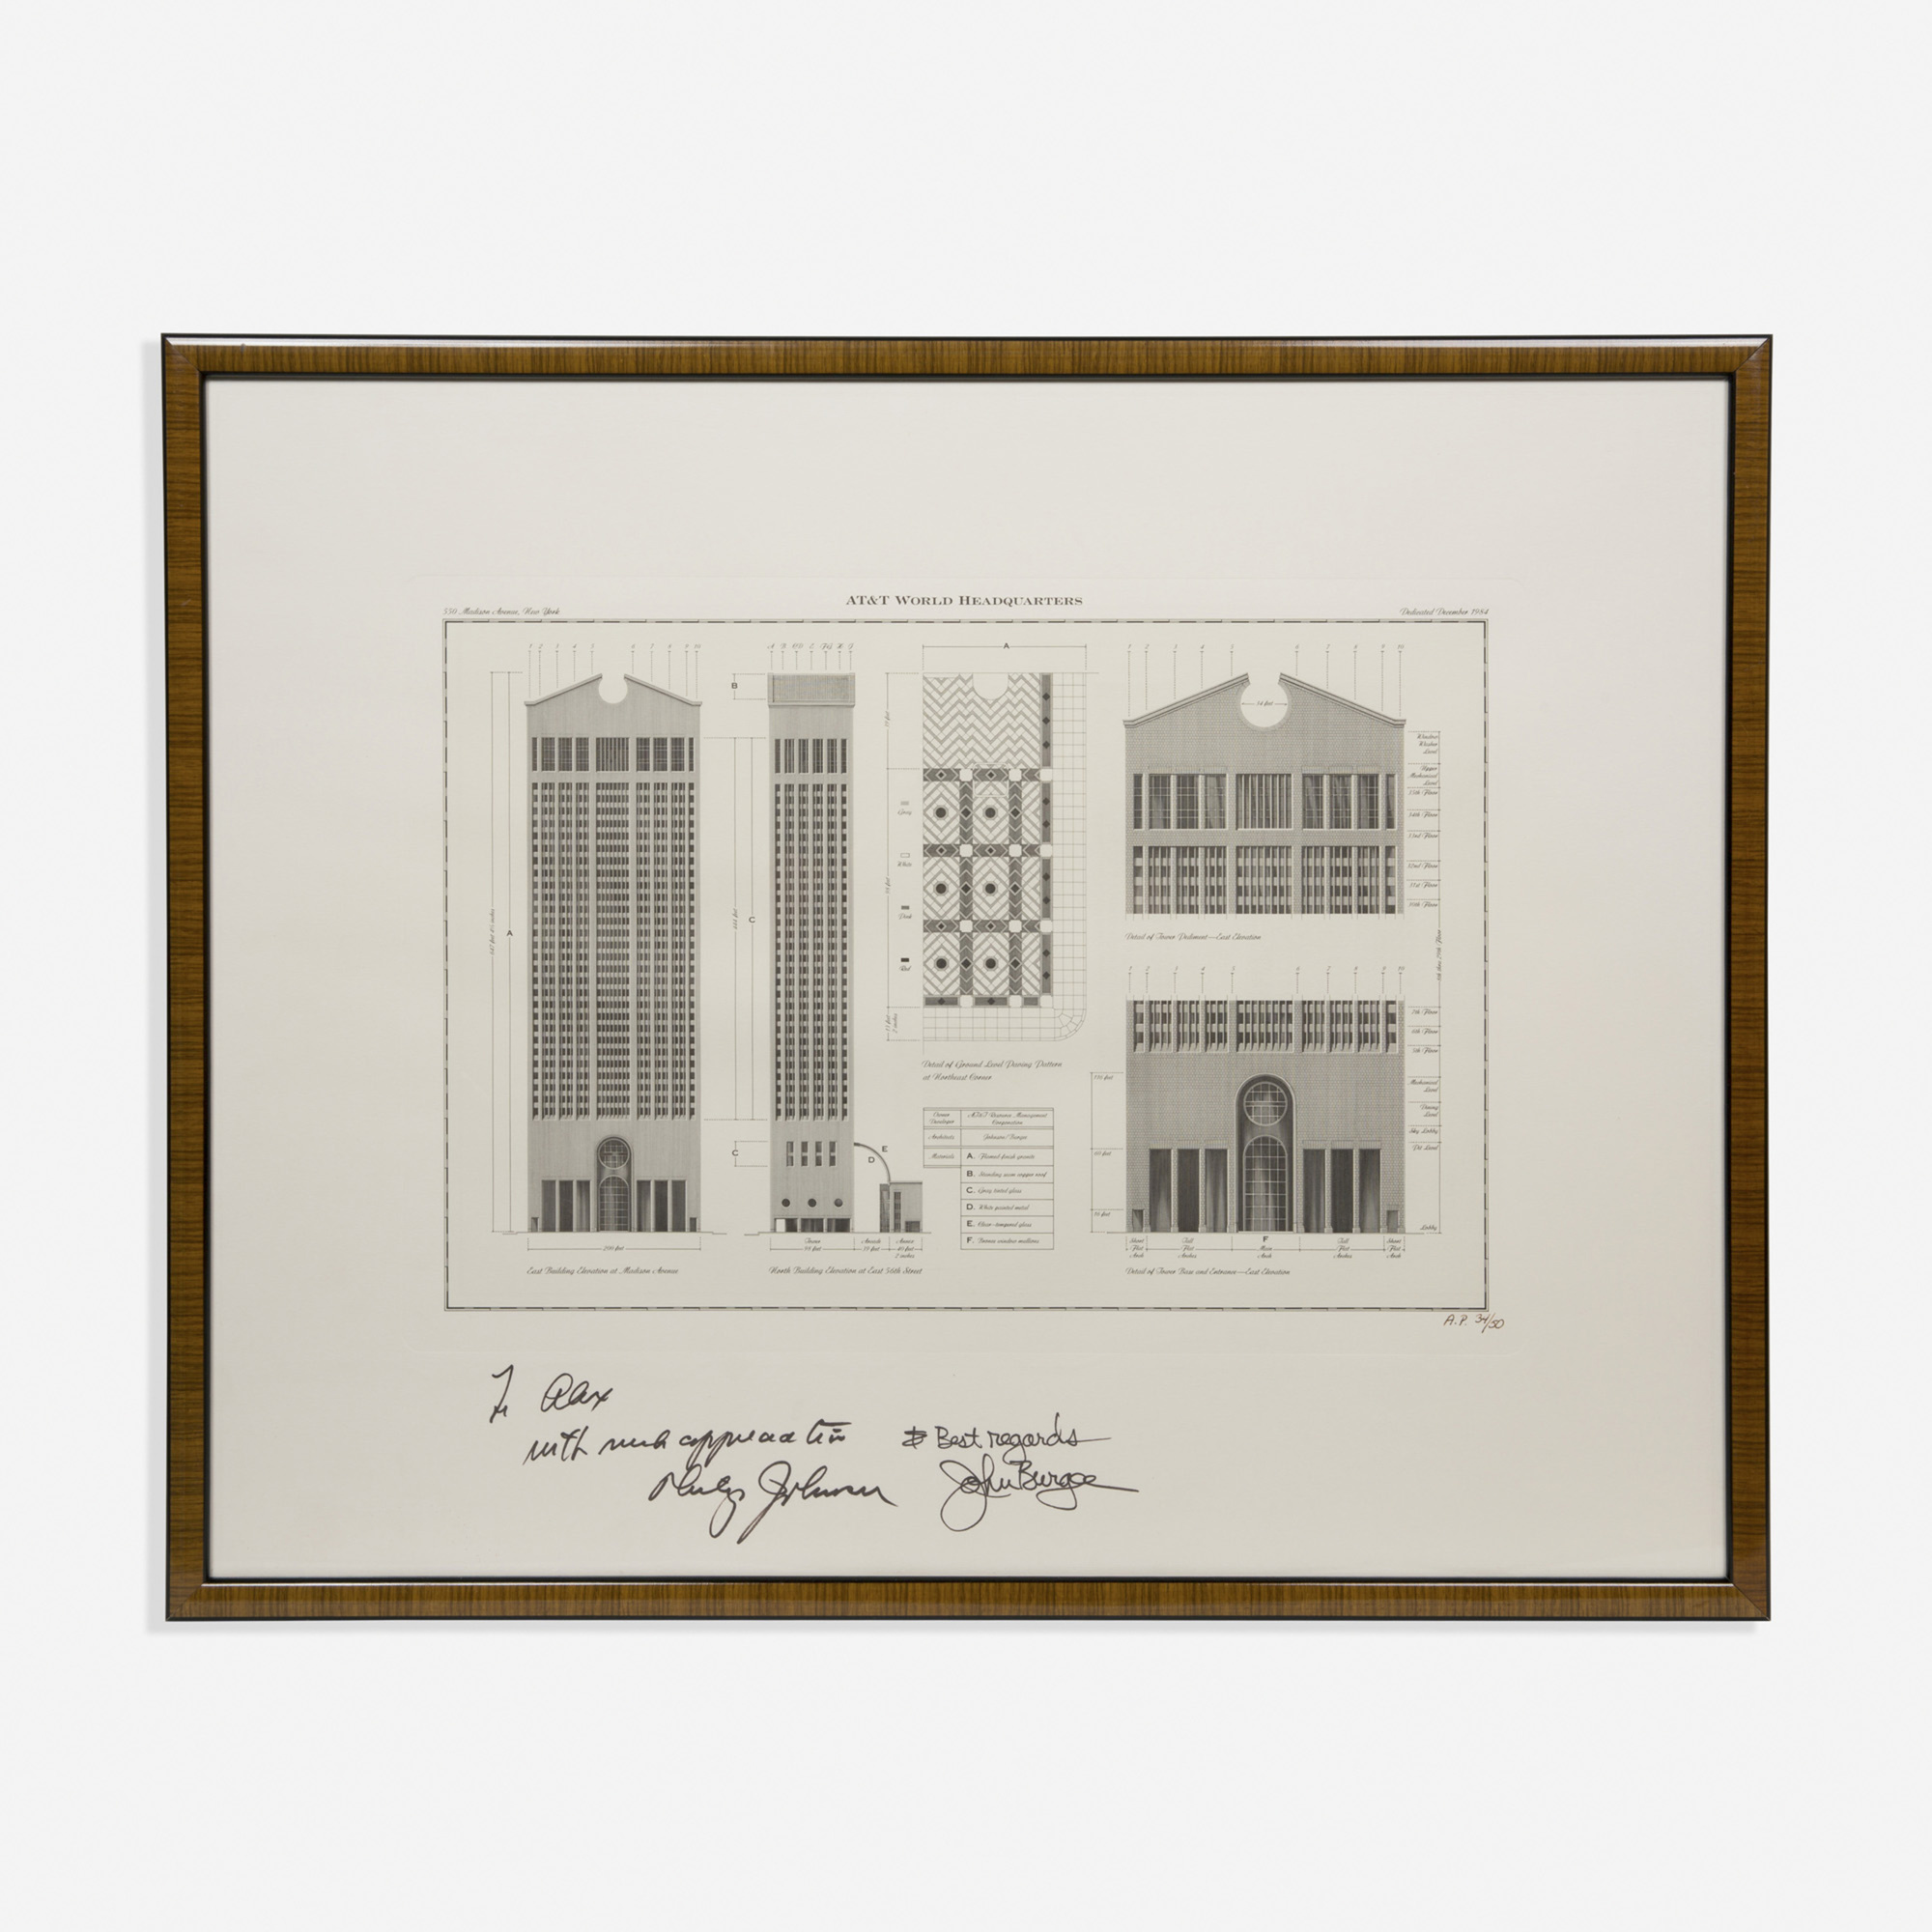 924: Philip Johnson and John Burgee / AT&T World Headquarters (1 of 1)